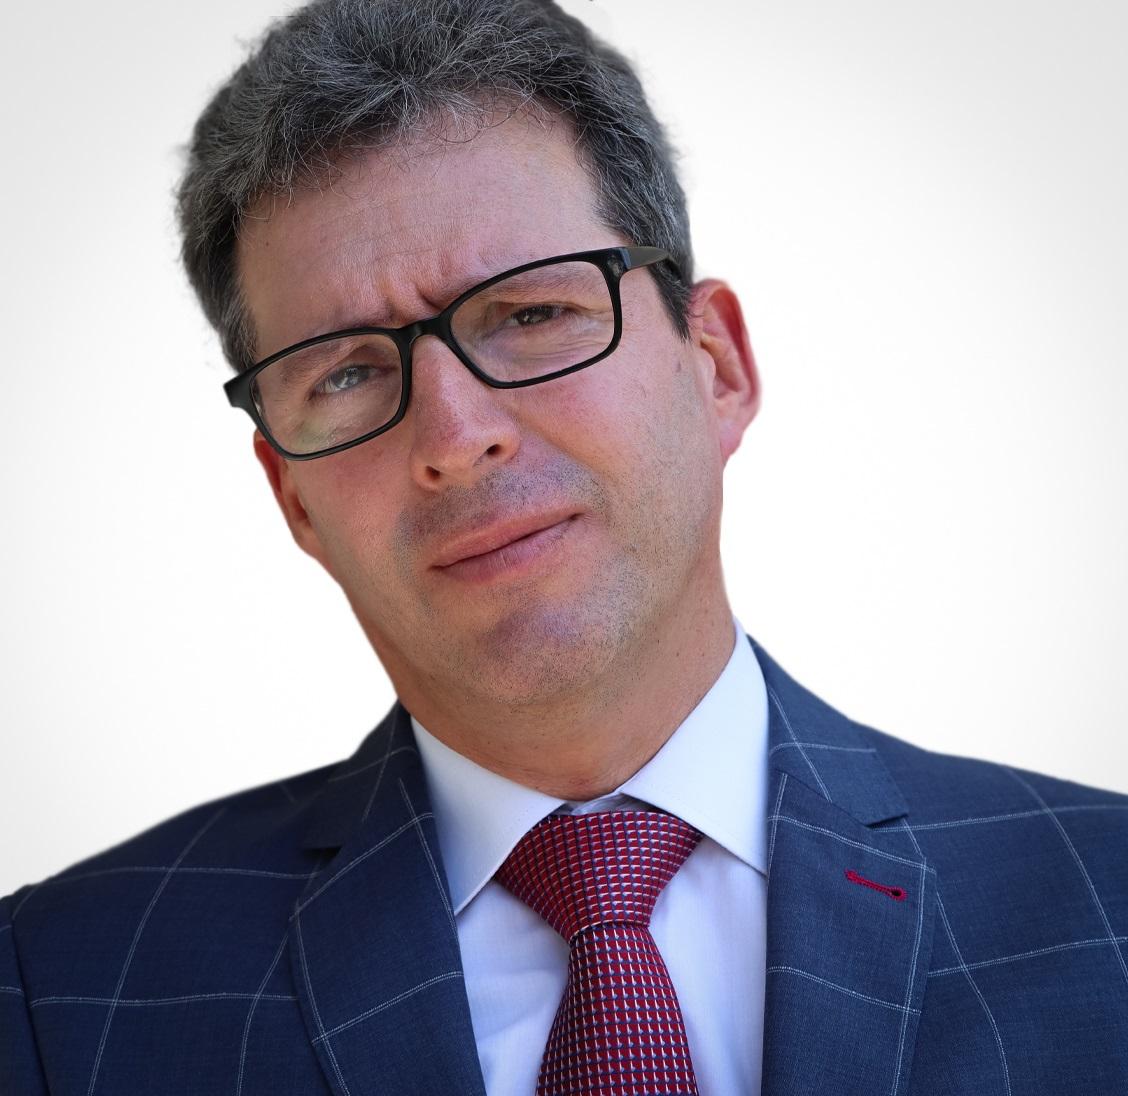 Alberto Alvarez-Jimenez (He/Him)